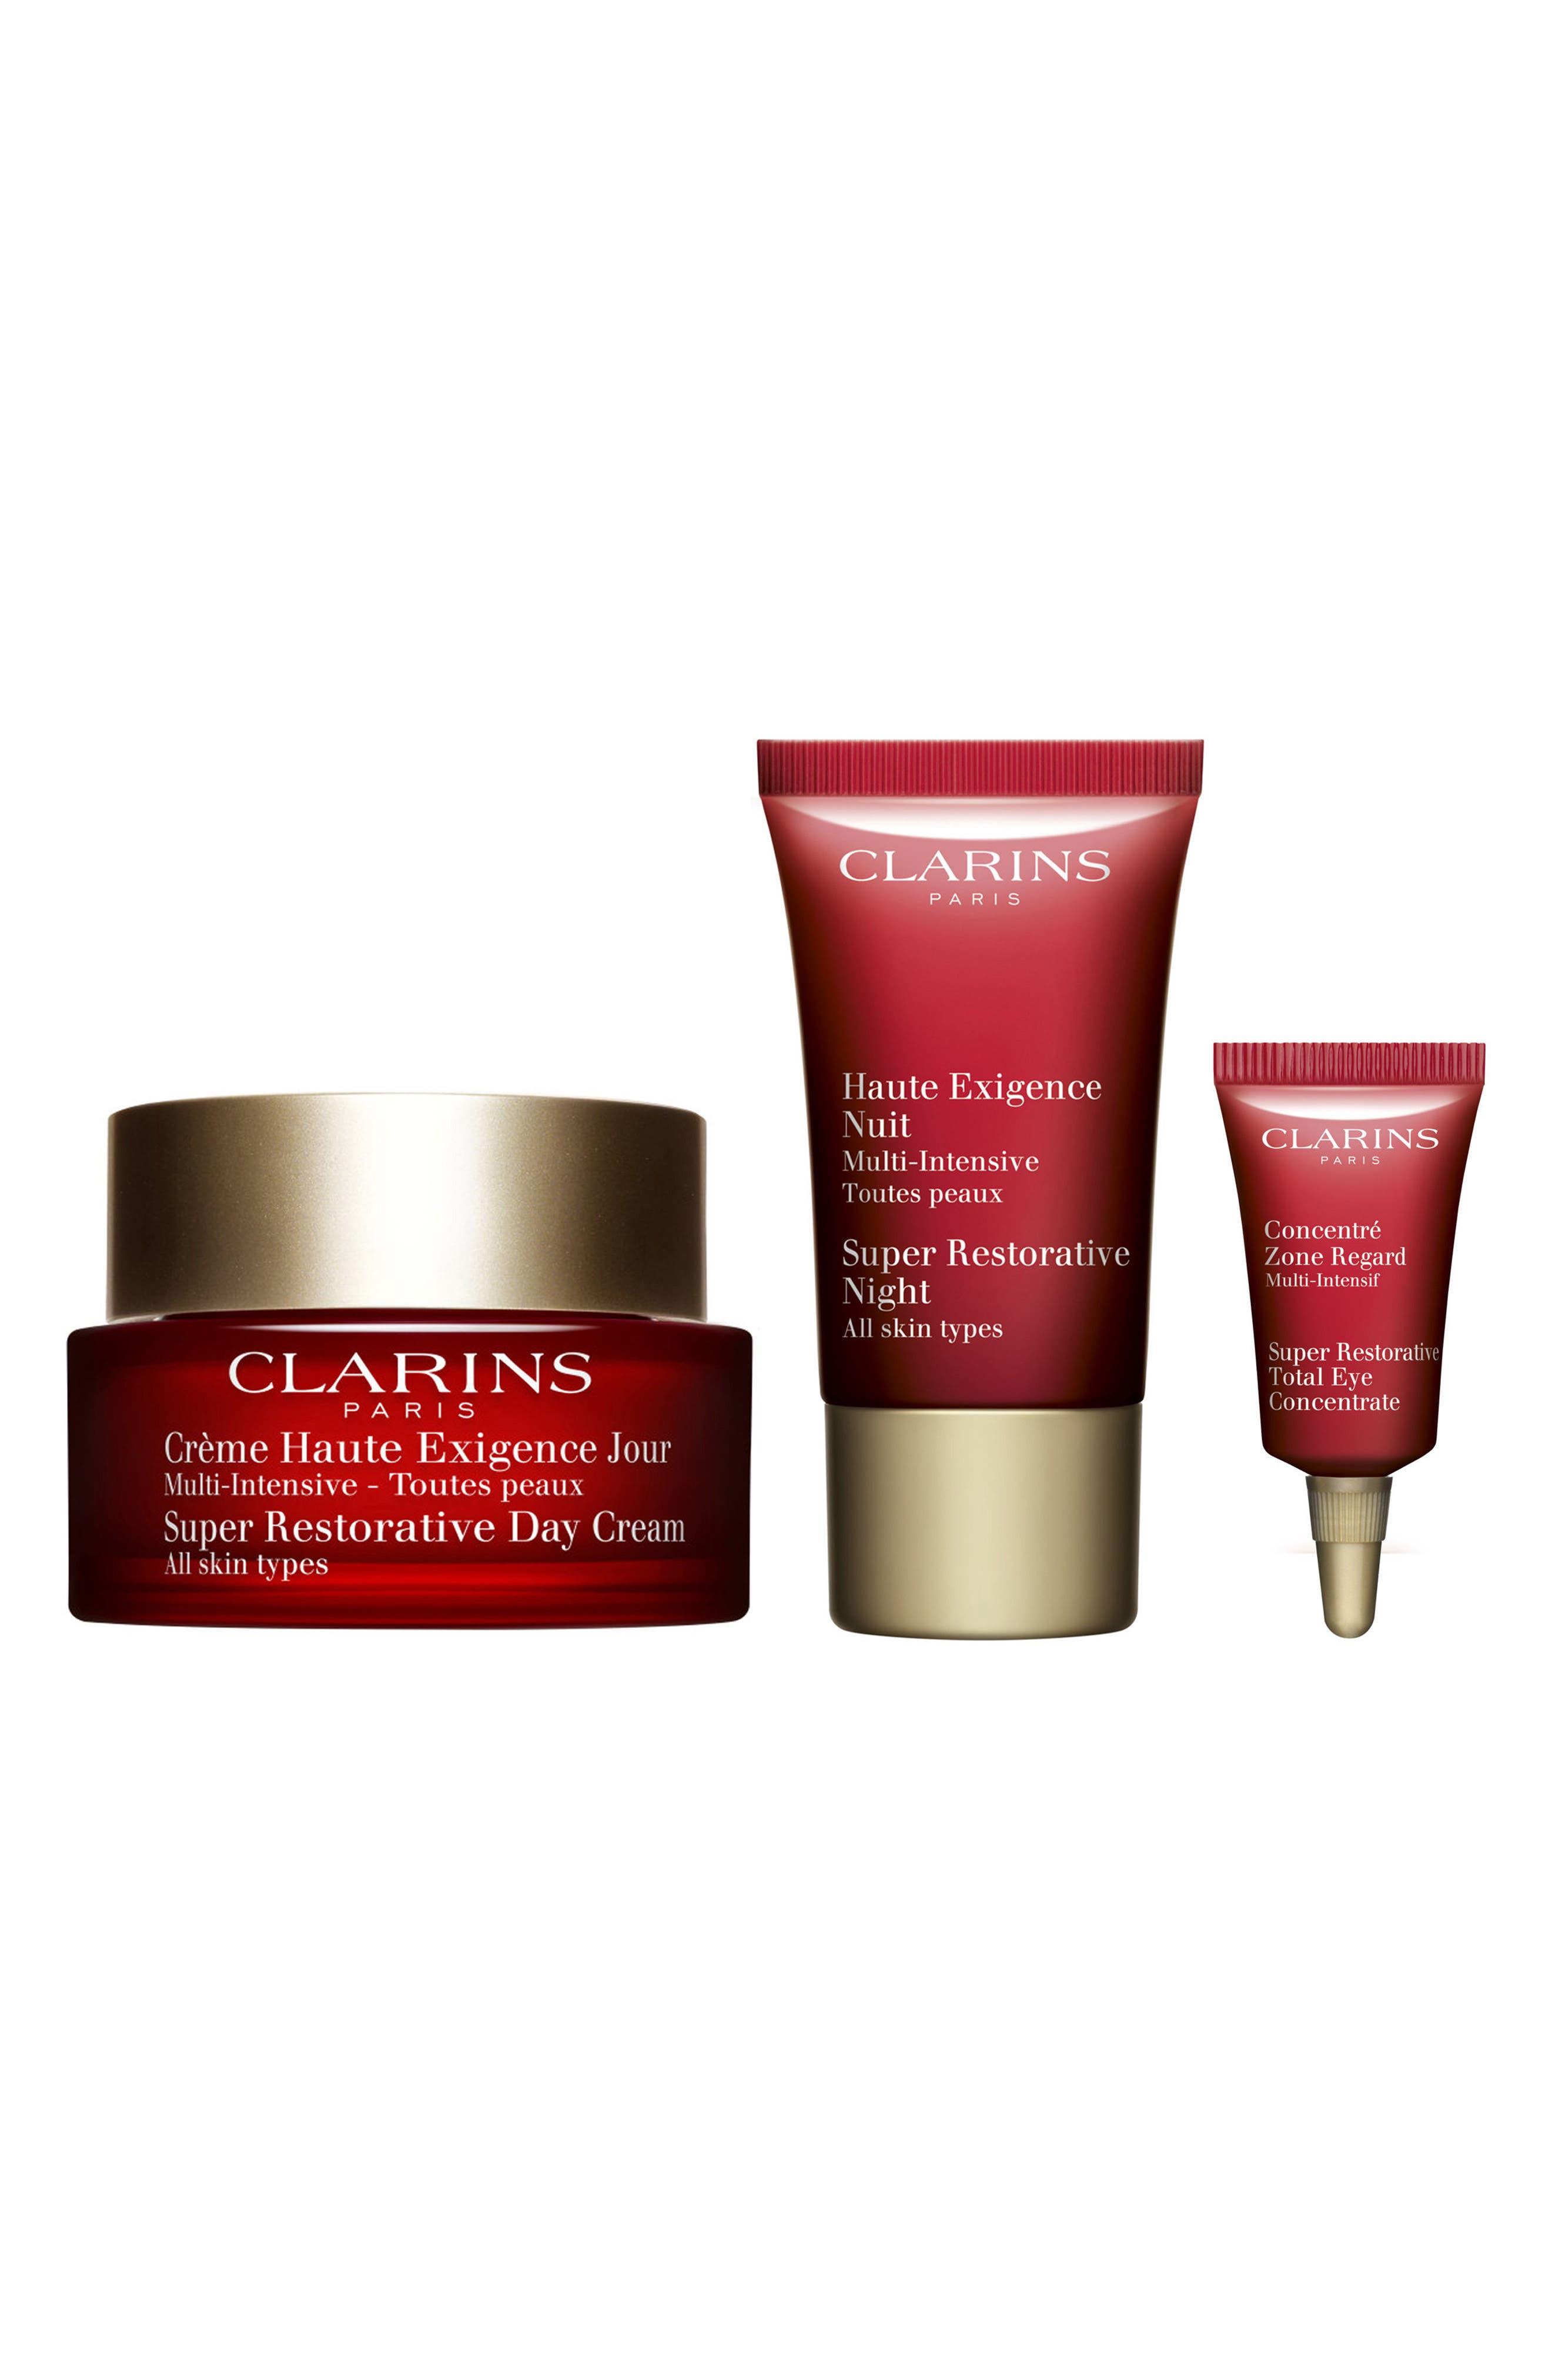 2 Pack - Clarins  Restoring Eye Wonders  1 set Clean & Clear Advantage Acne Control Facial Moisturizer, 4 Fl. Oz.